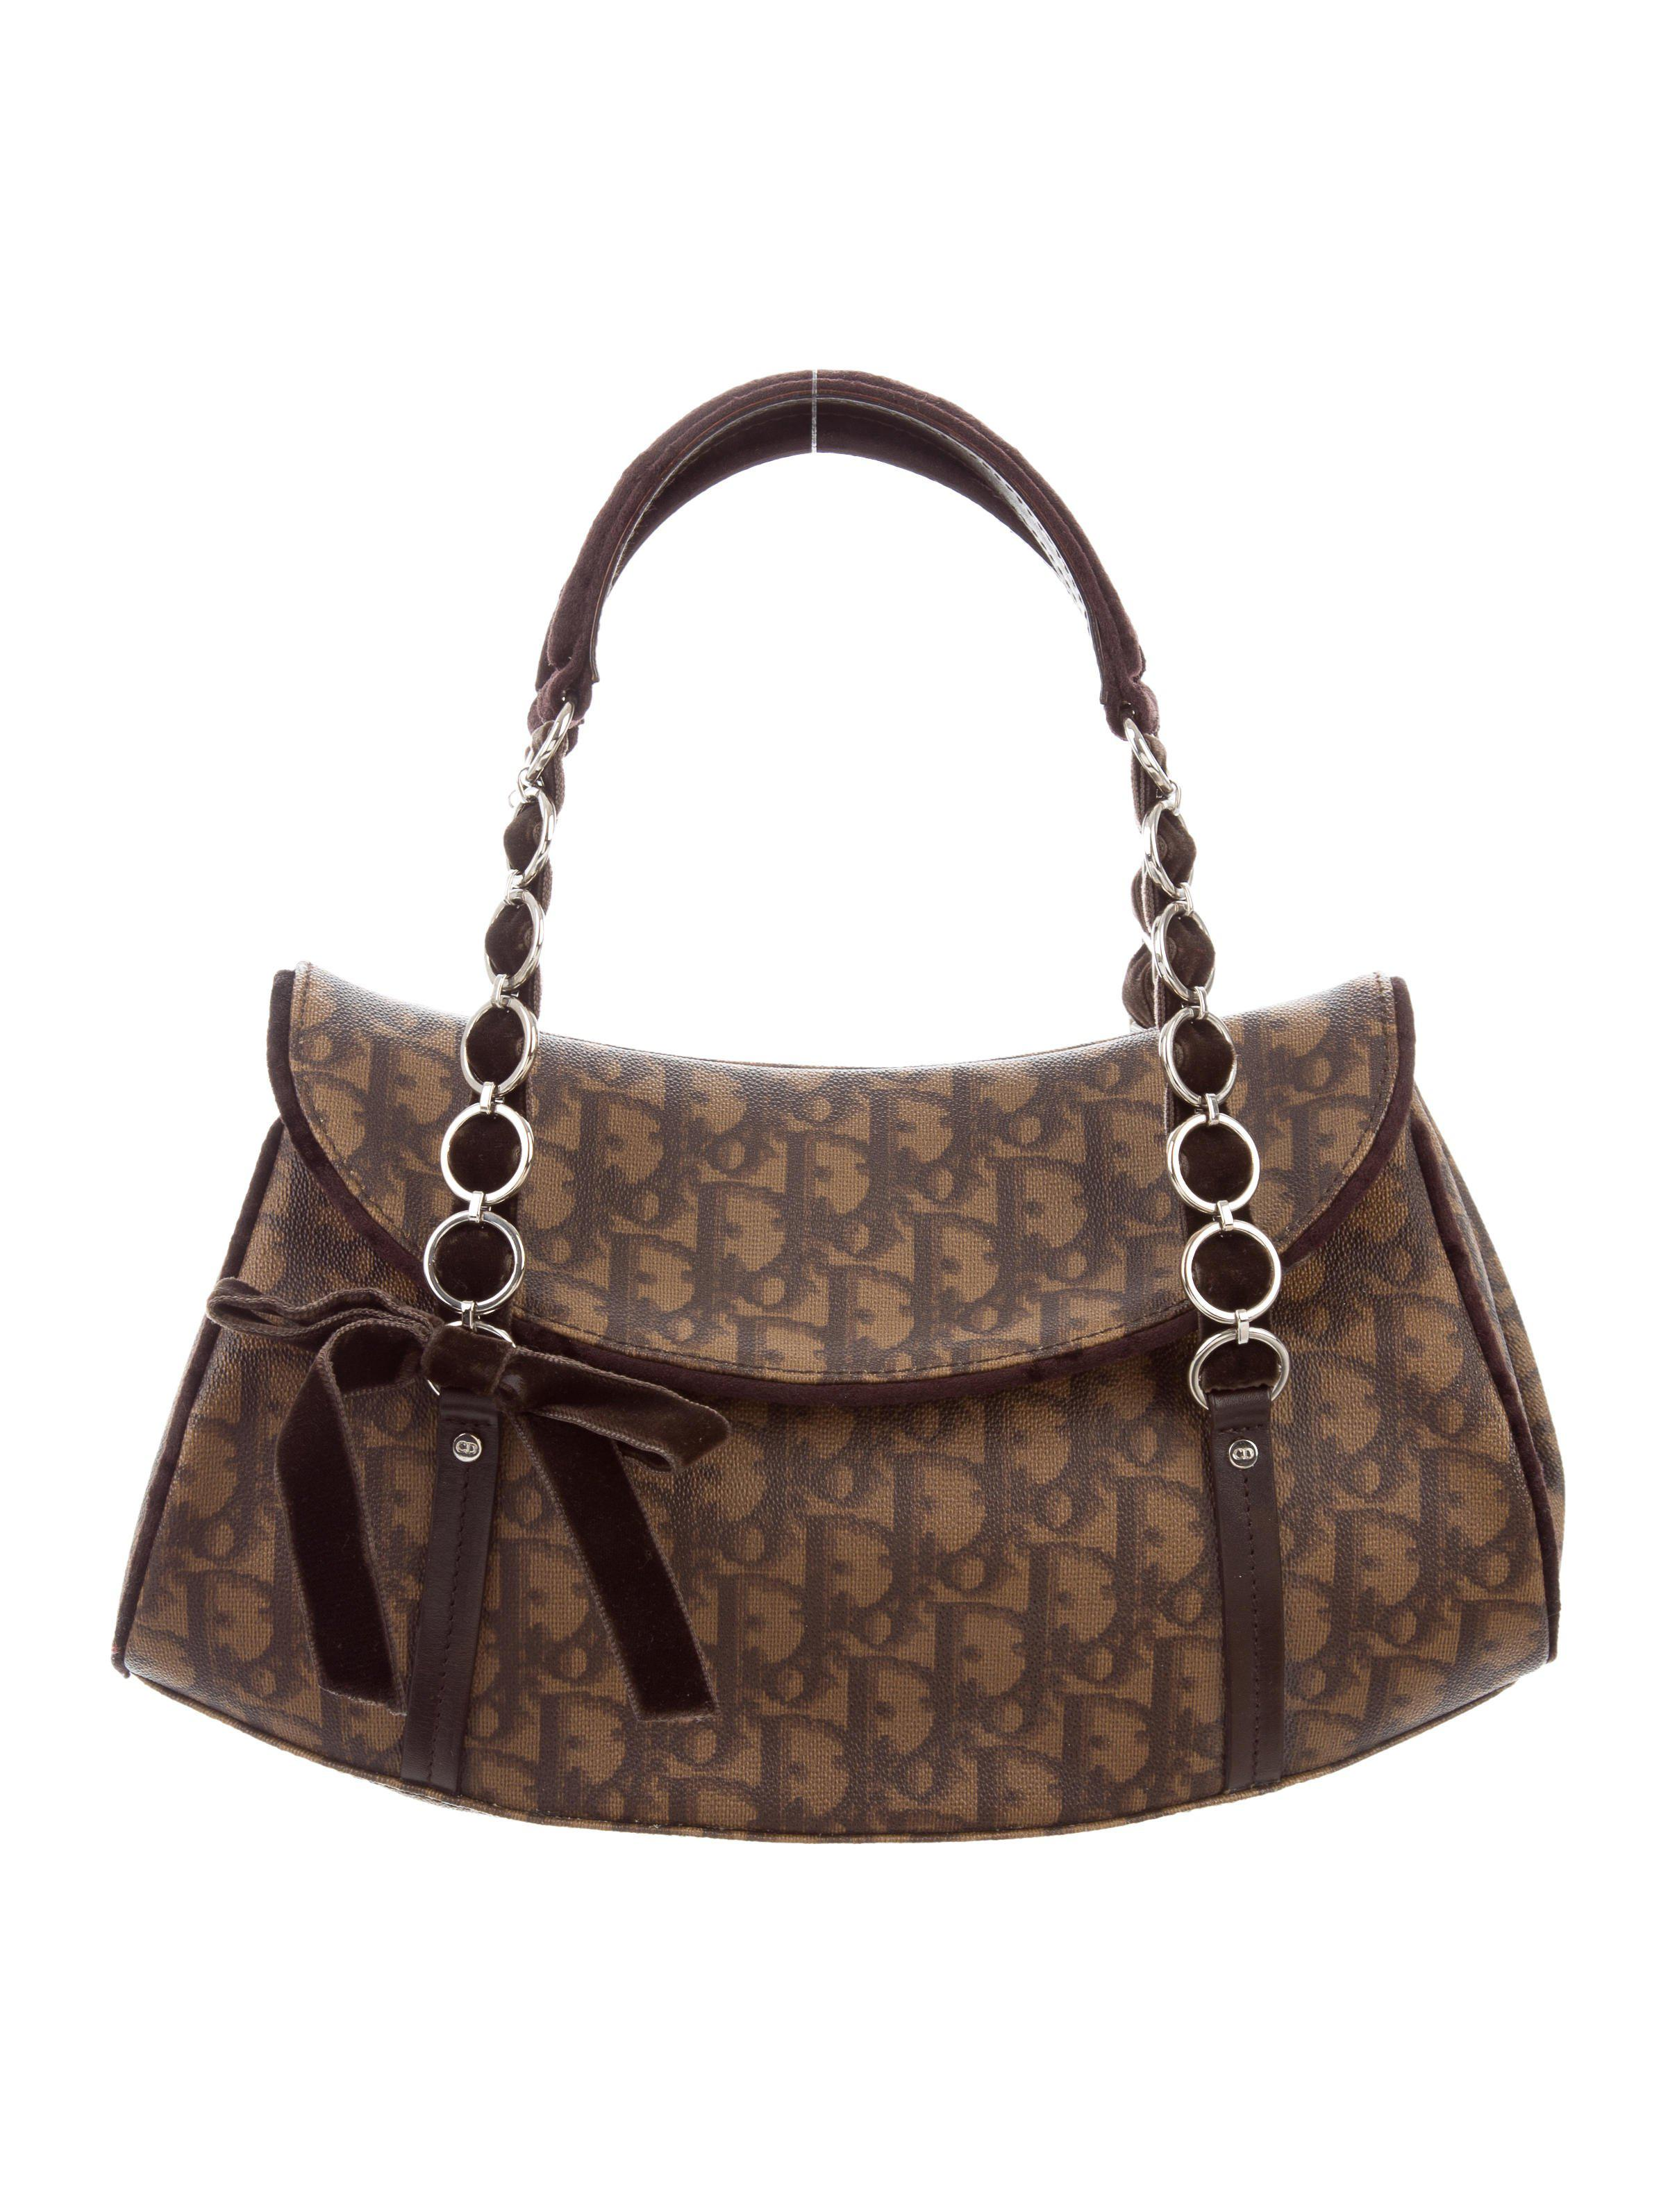 4135ad3f754f Lyst - Dior Diorissimo Handle Bag Brown in Metallic